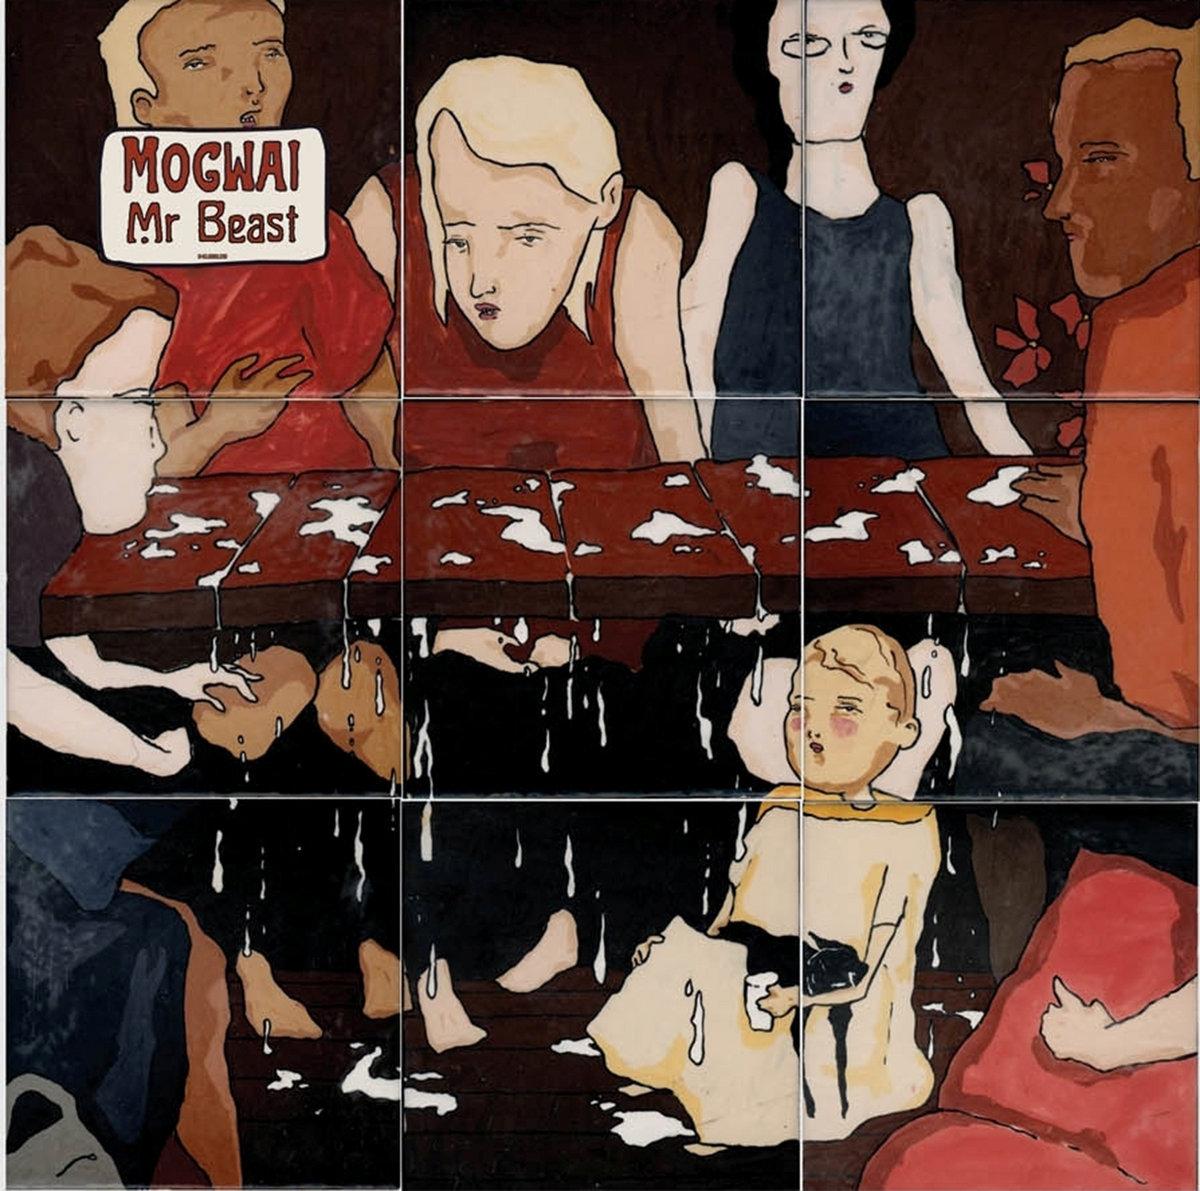 Mr. Beast | Mogwai